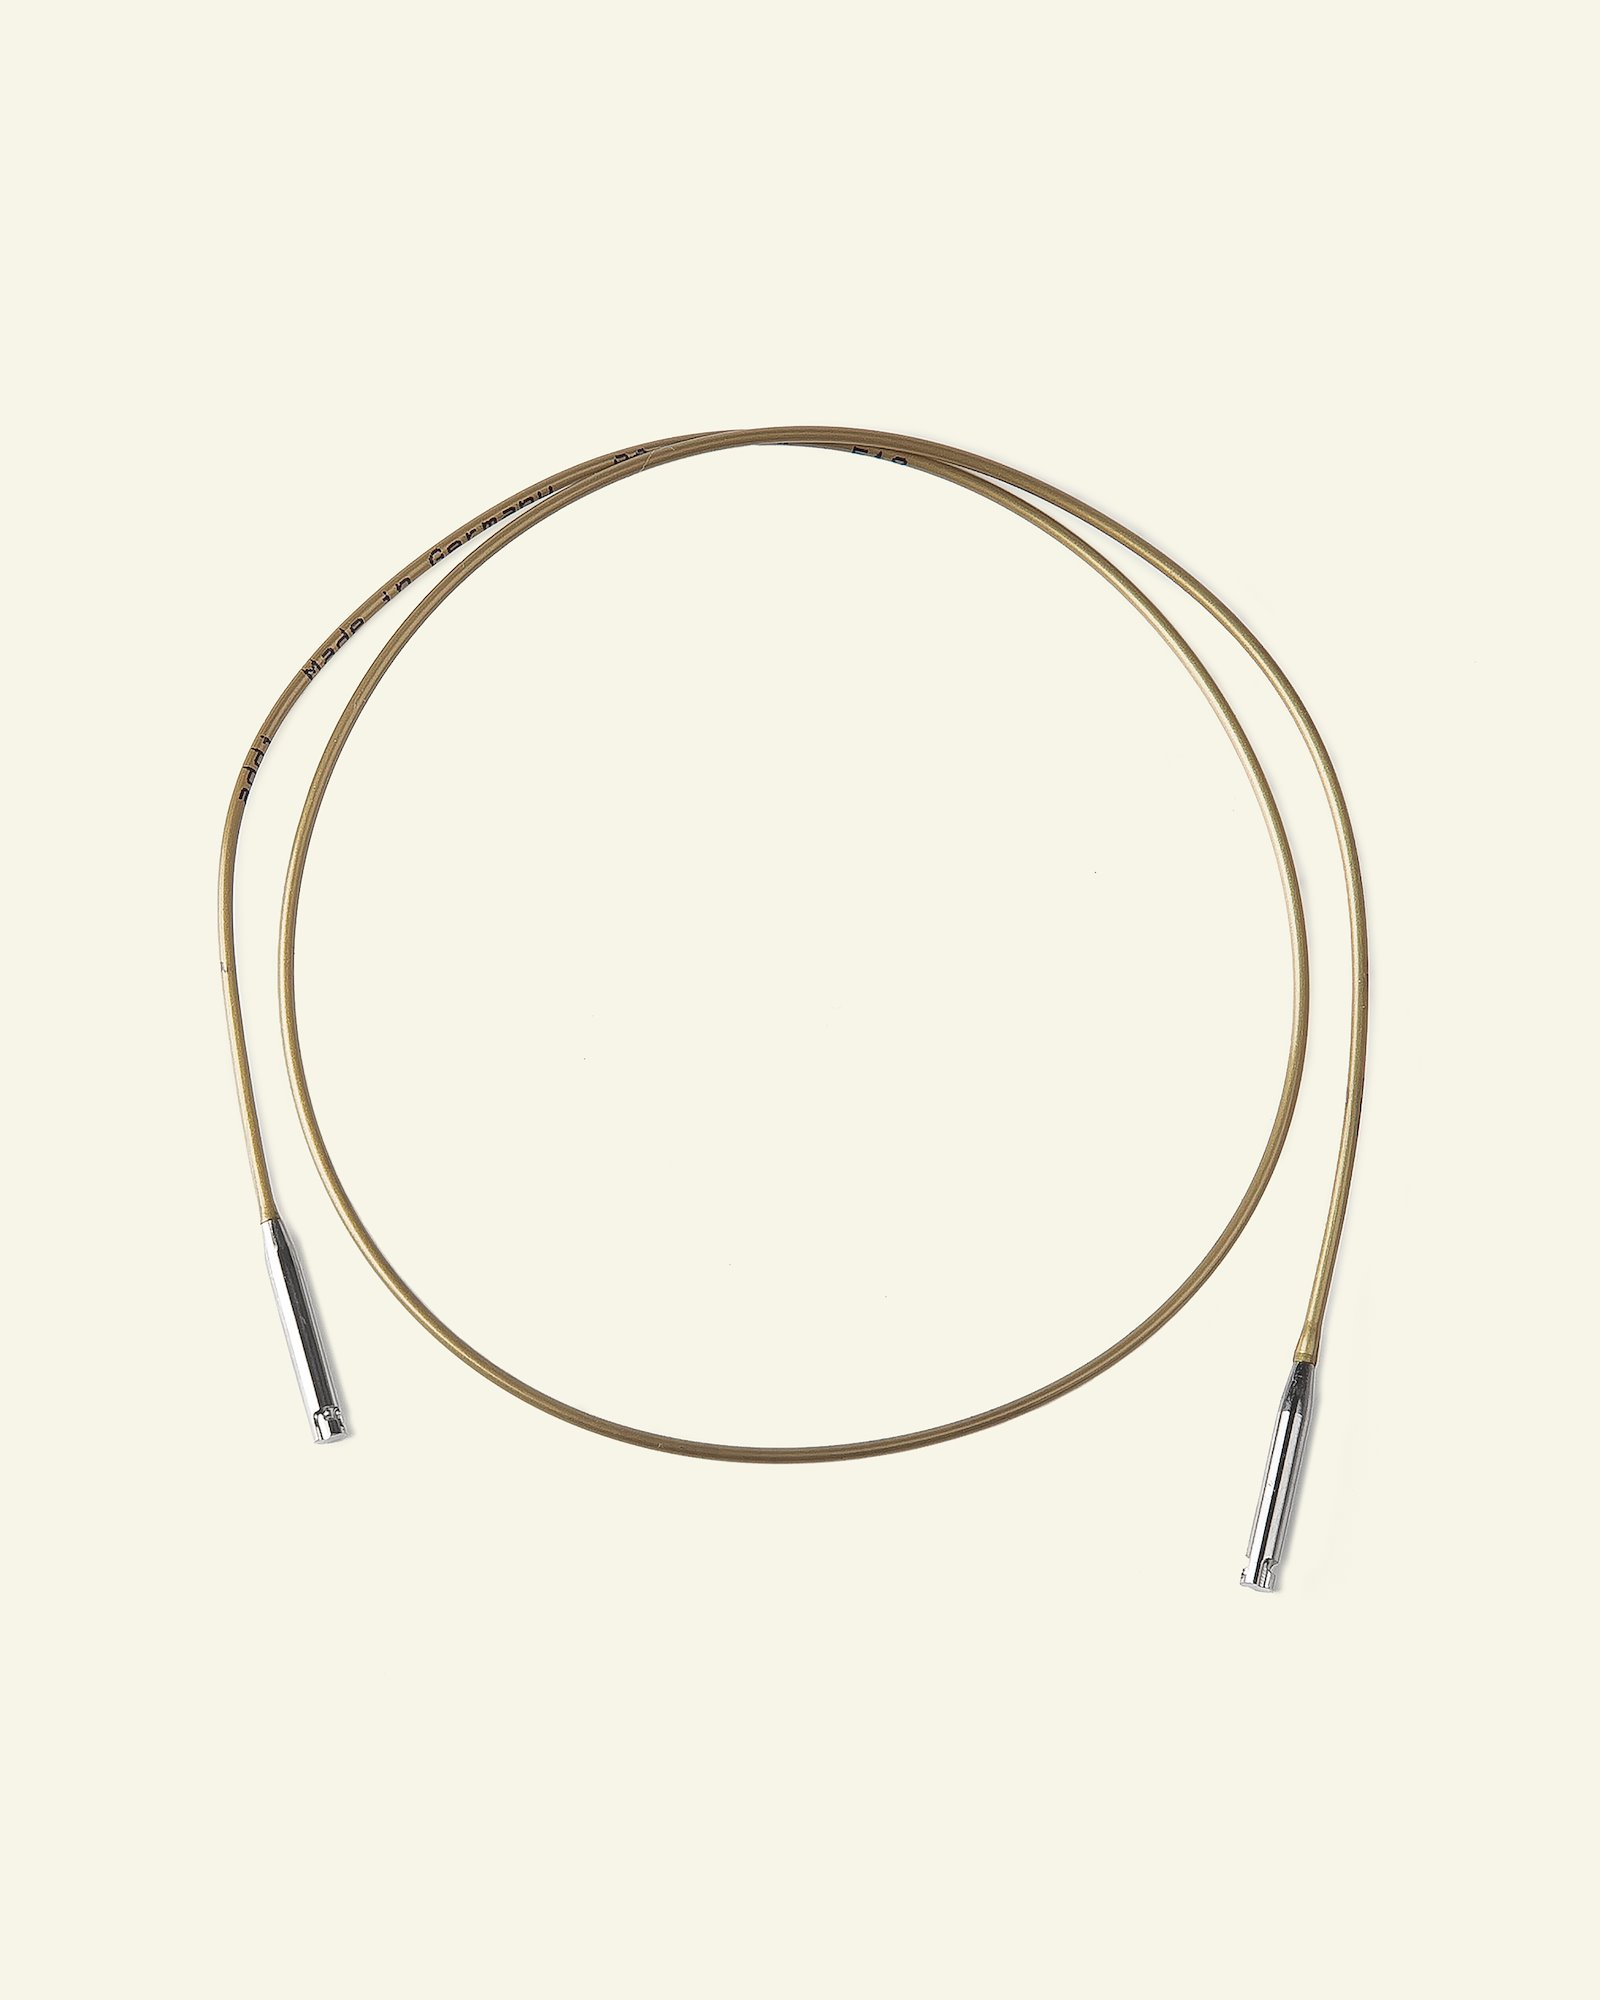 addiclick Cord, individually 80cm